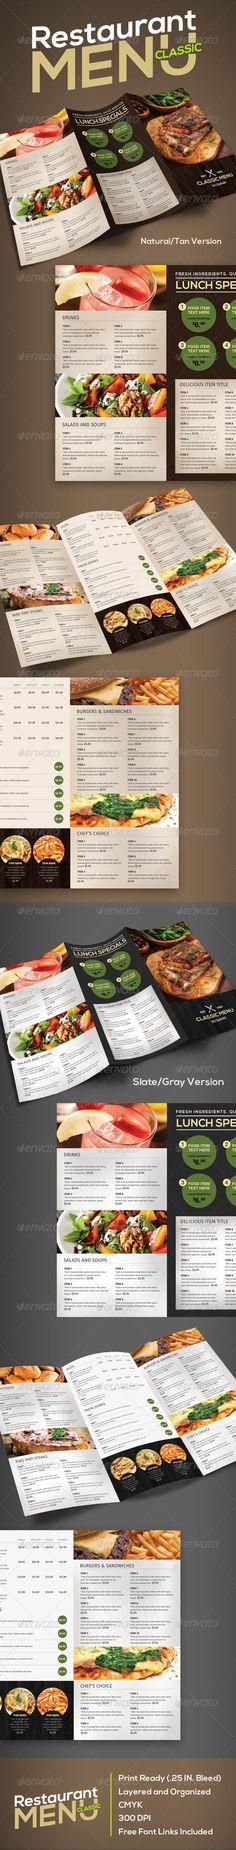 Restaurant Menu (Classic) Template #design #speisekarte Download ...